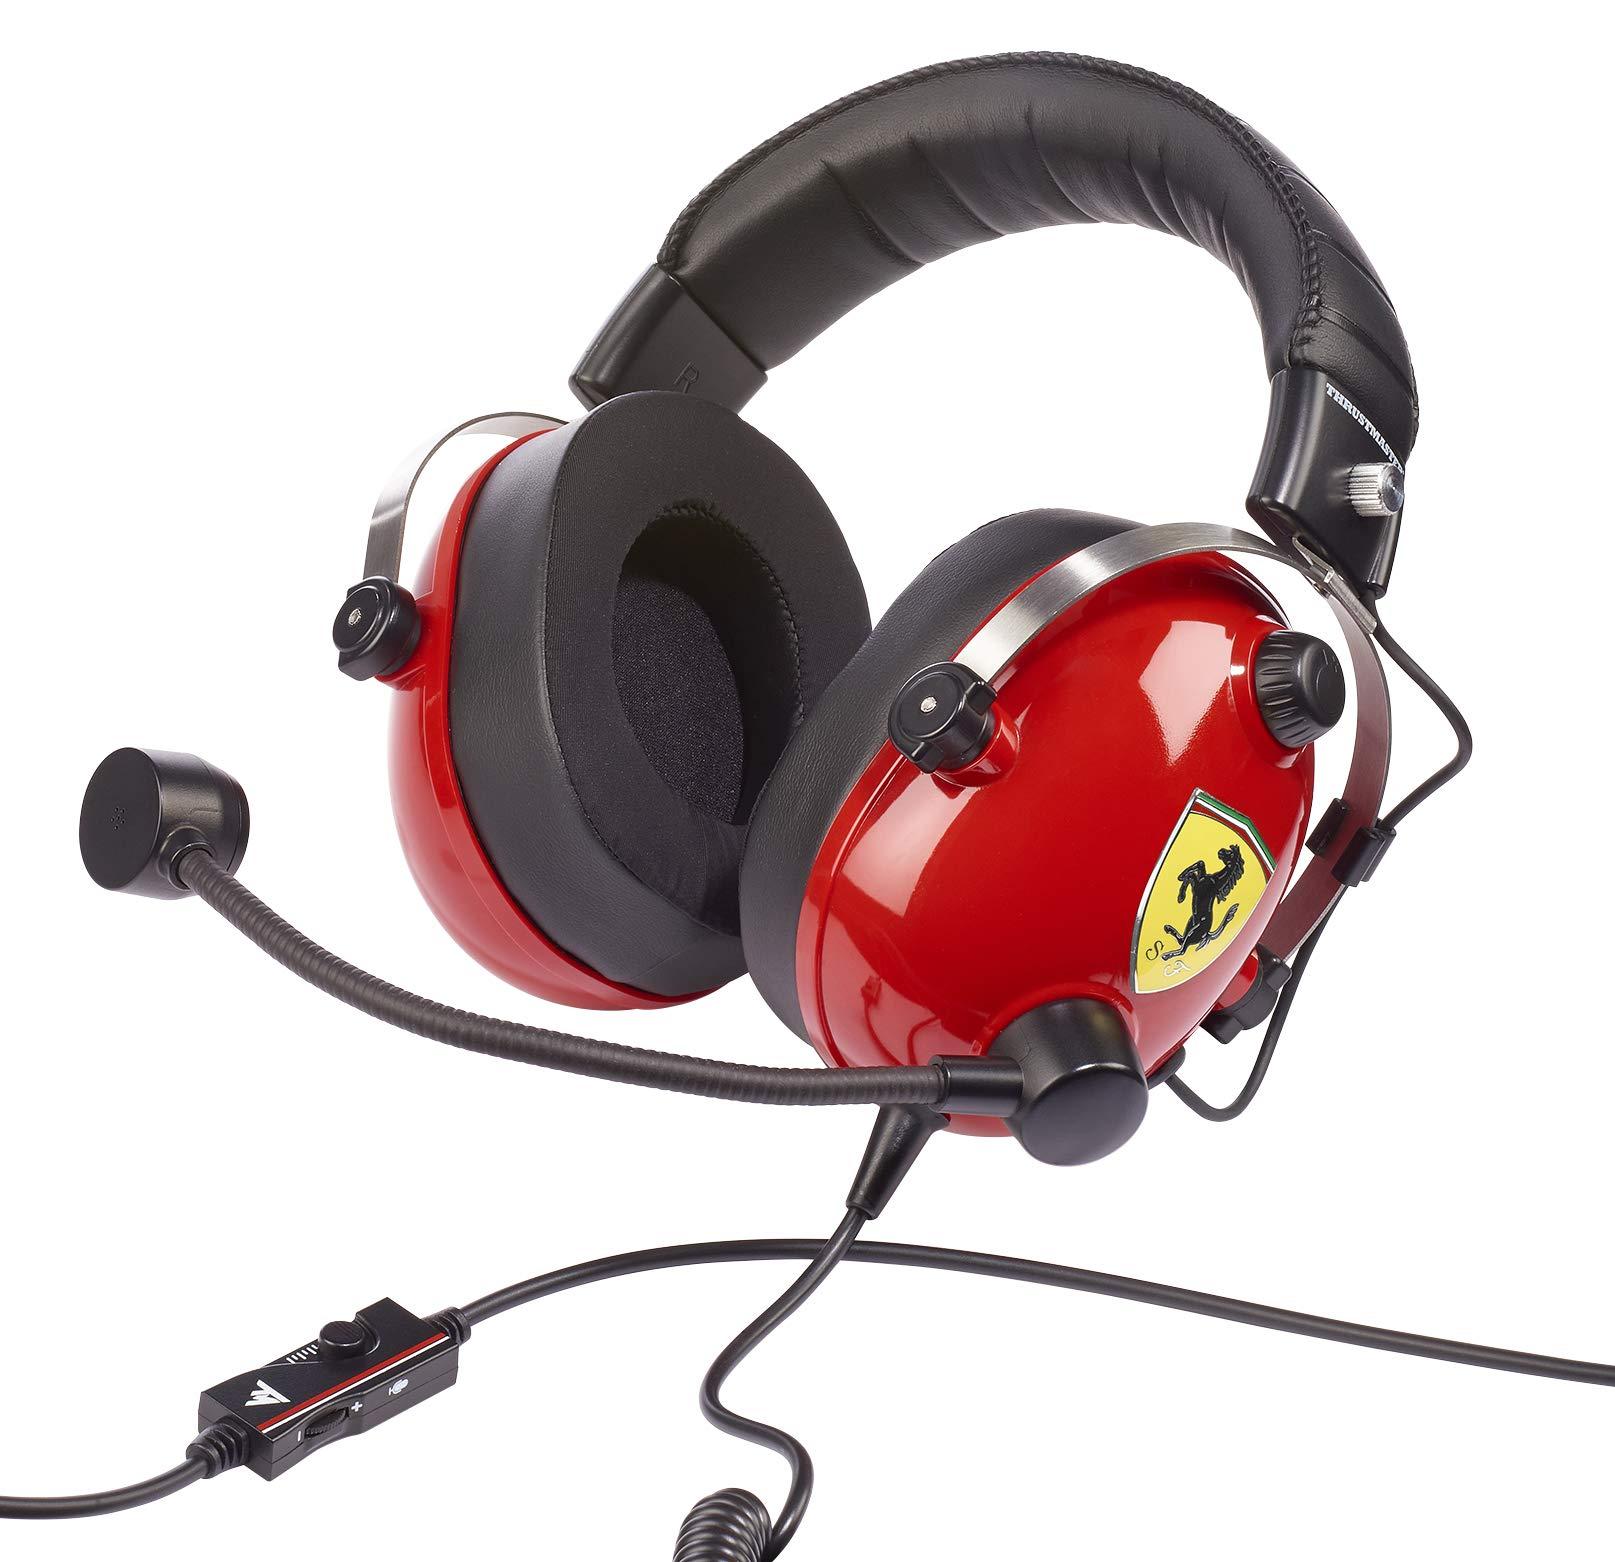 Mouses, Teclados y Controles > Controles para Gamers > <b>Simuladores de Manejo</b>